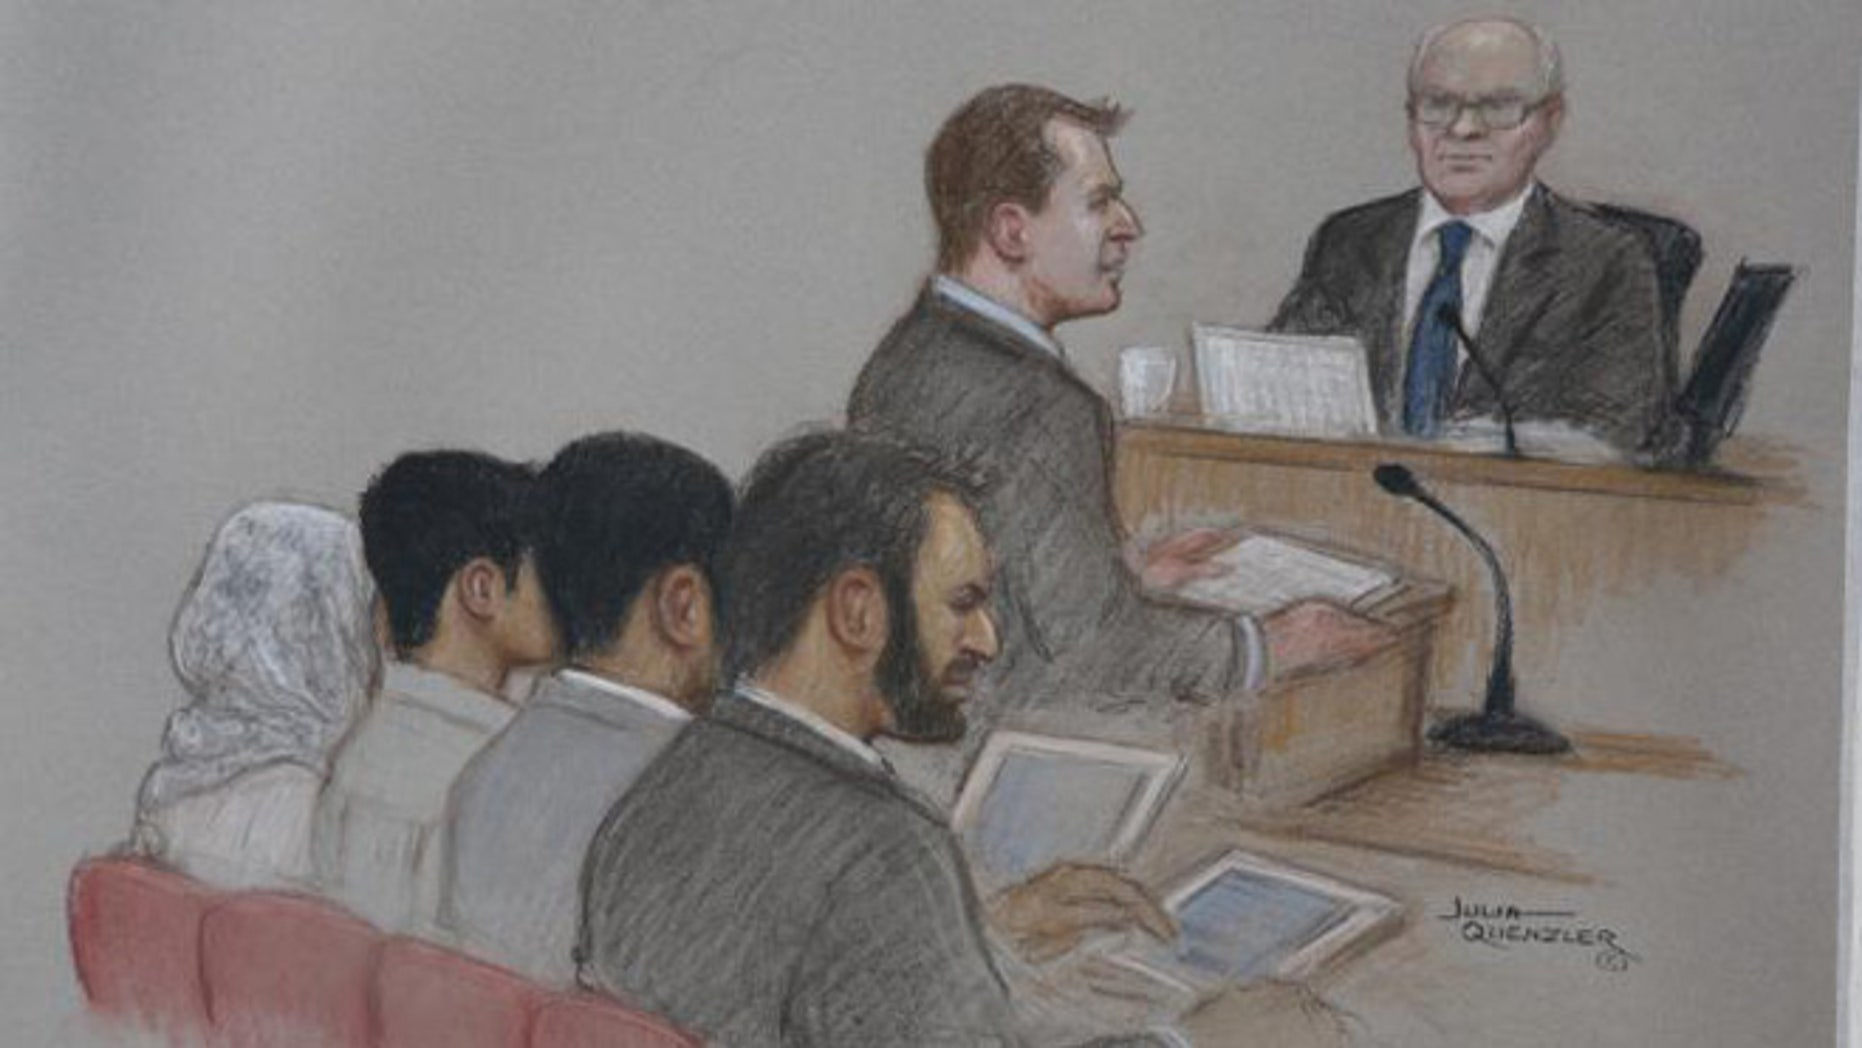 An artist's sketch of the boy being sentenced.